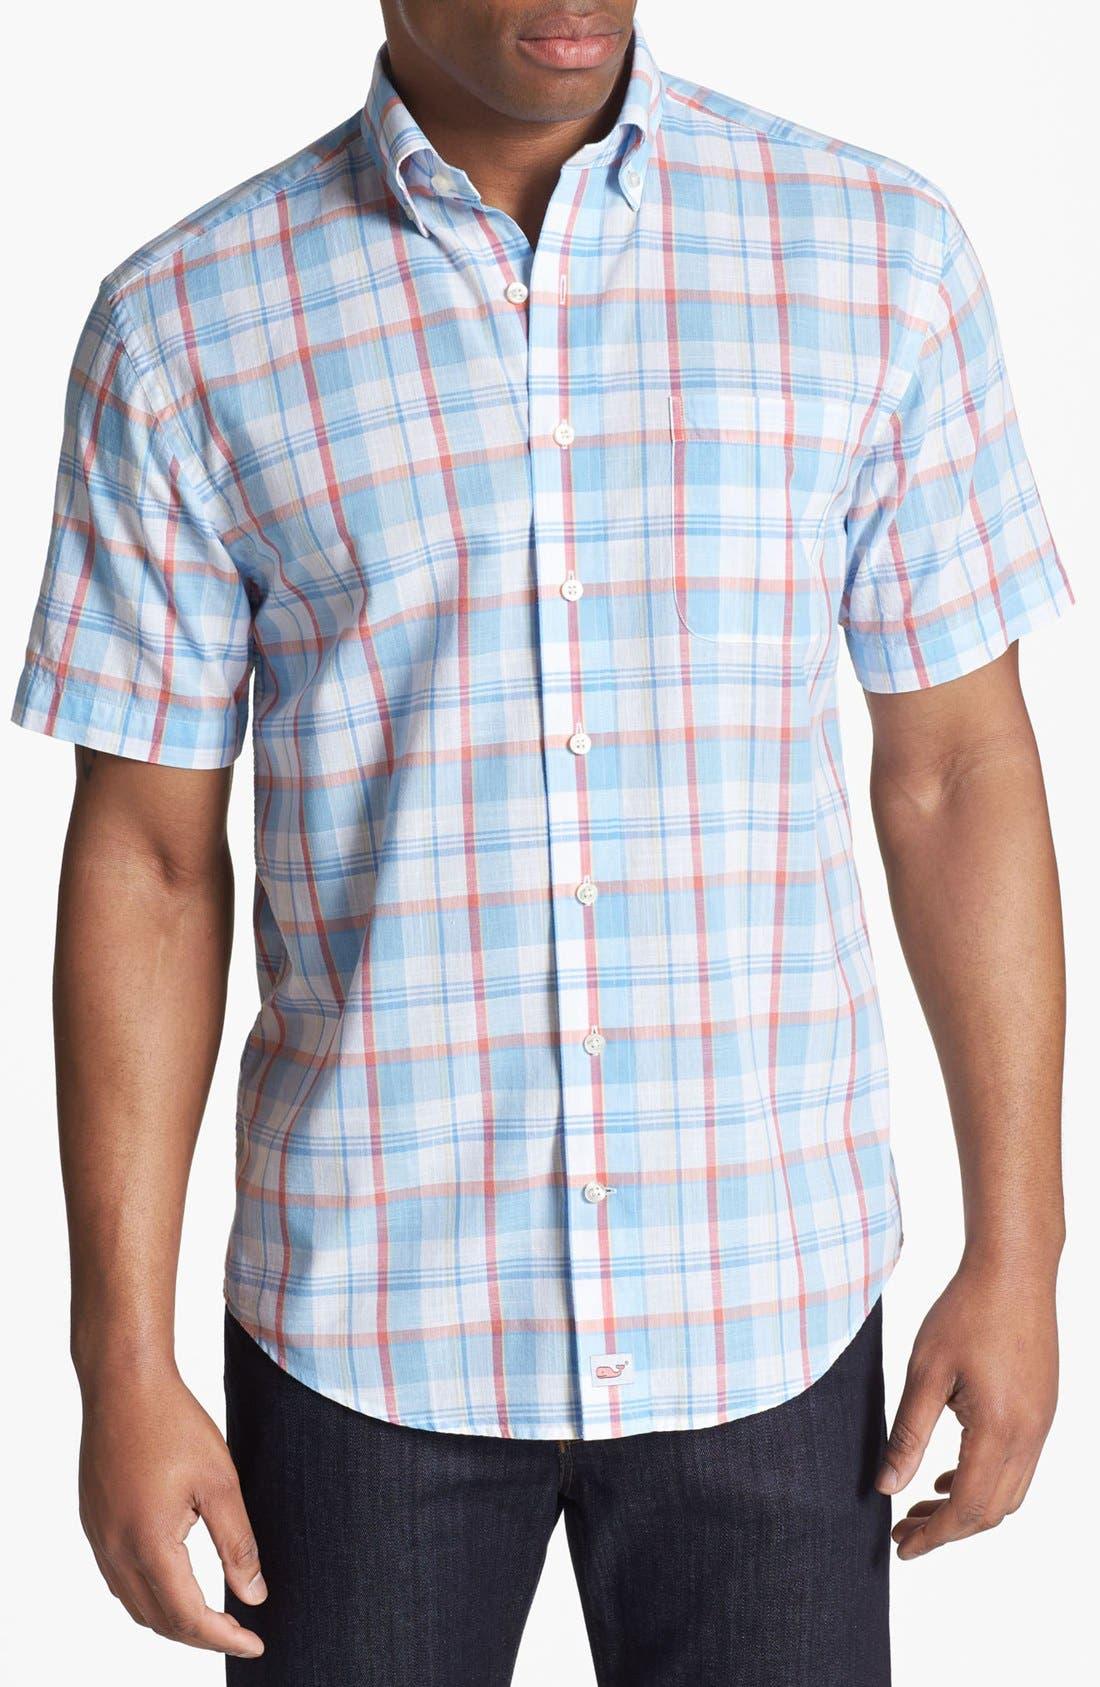 Alternate Image 1 Selected - Vineyard Vines 'Murray' Short Sleeve Sport Shirt